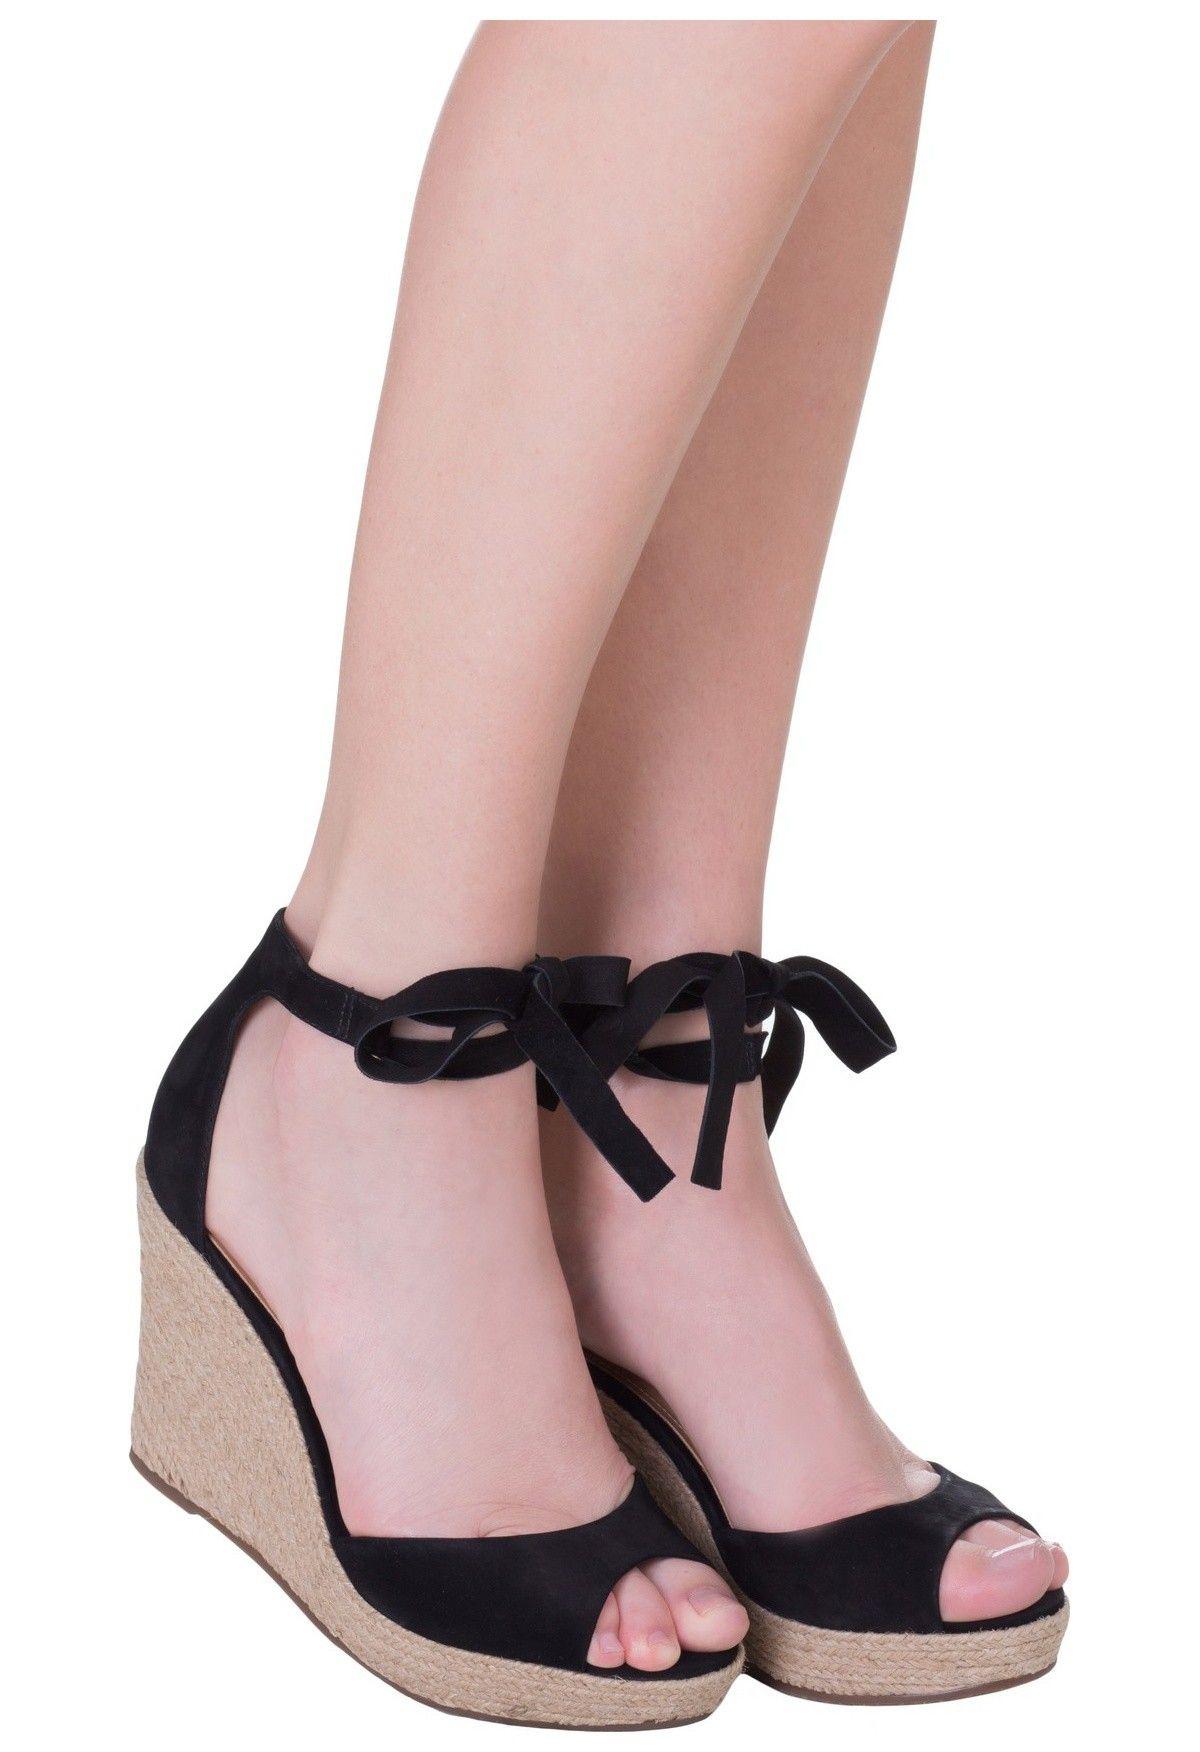 754f9c171 SCHUTZ - Sandália plataforma ballerina - preta - OQVestir | zapatos ...